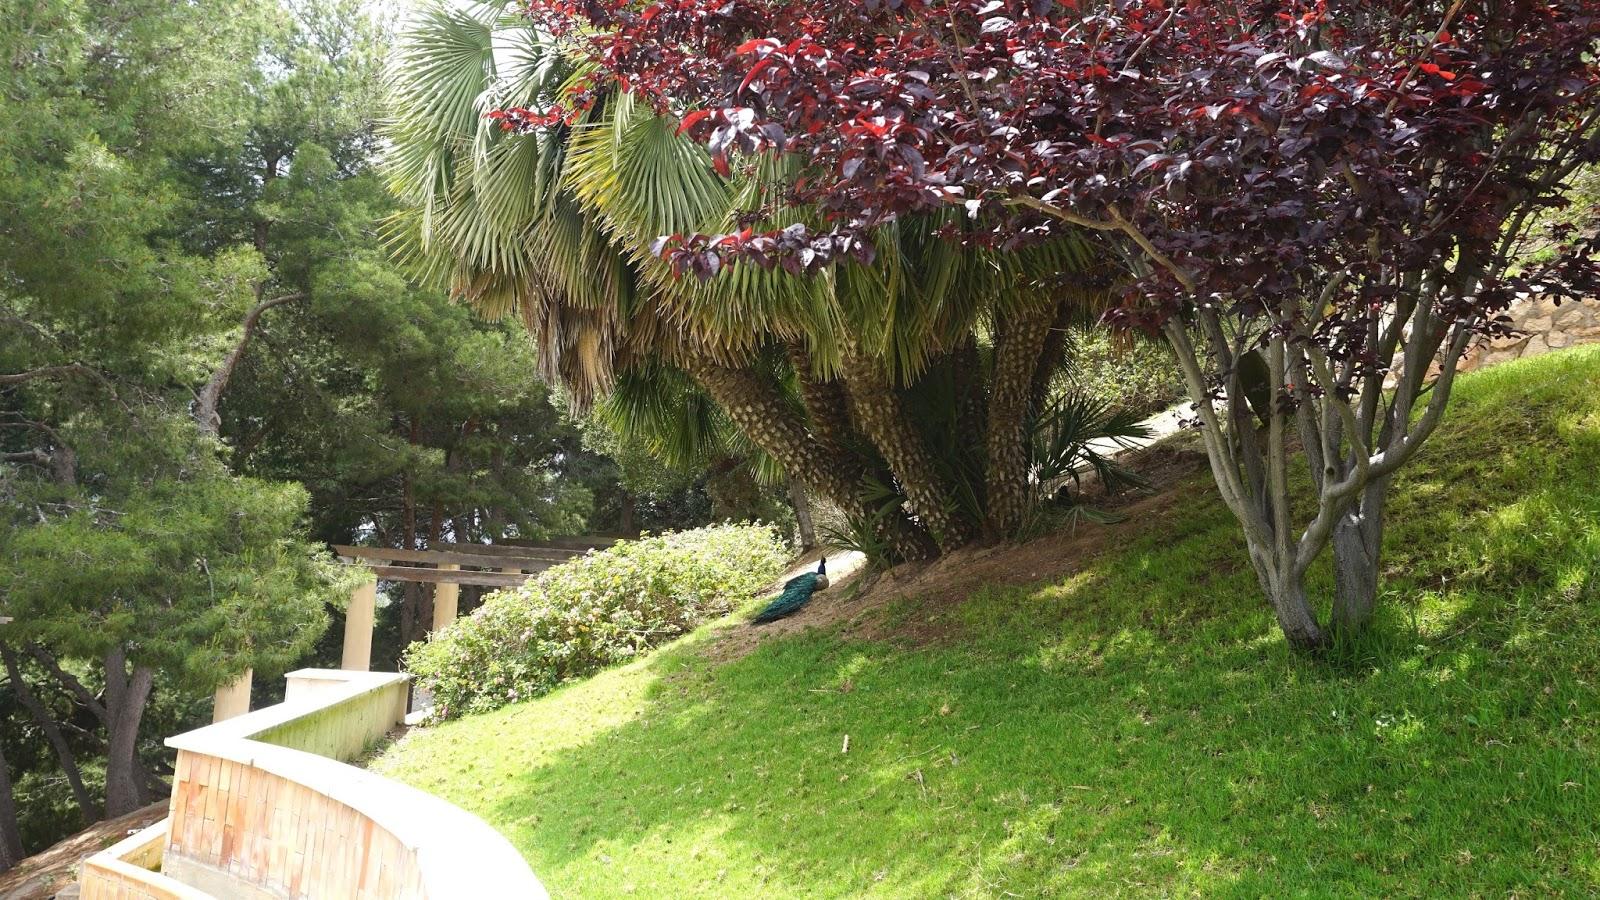 paw Hiszpania, ogród przy Castillo de la Concepcion, Kartagena, prowincja Murcja,  Costa Calida